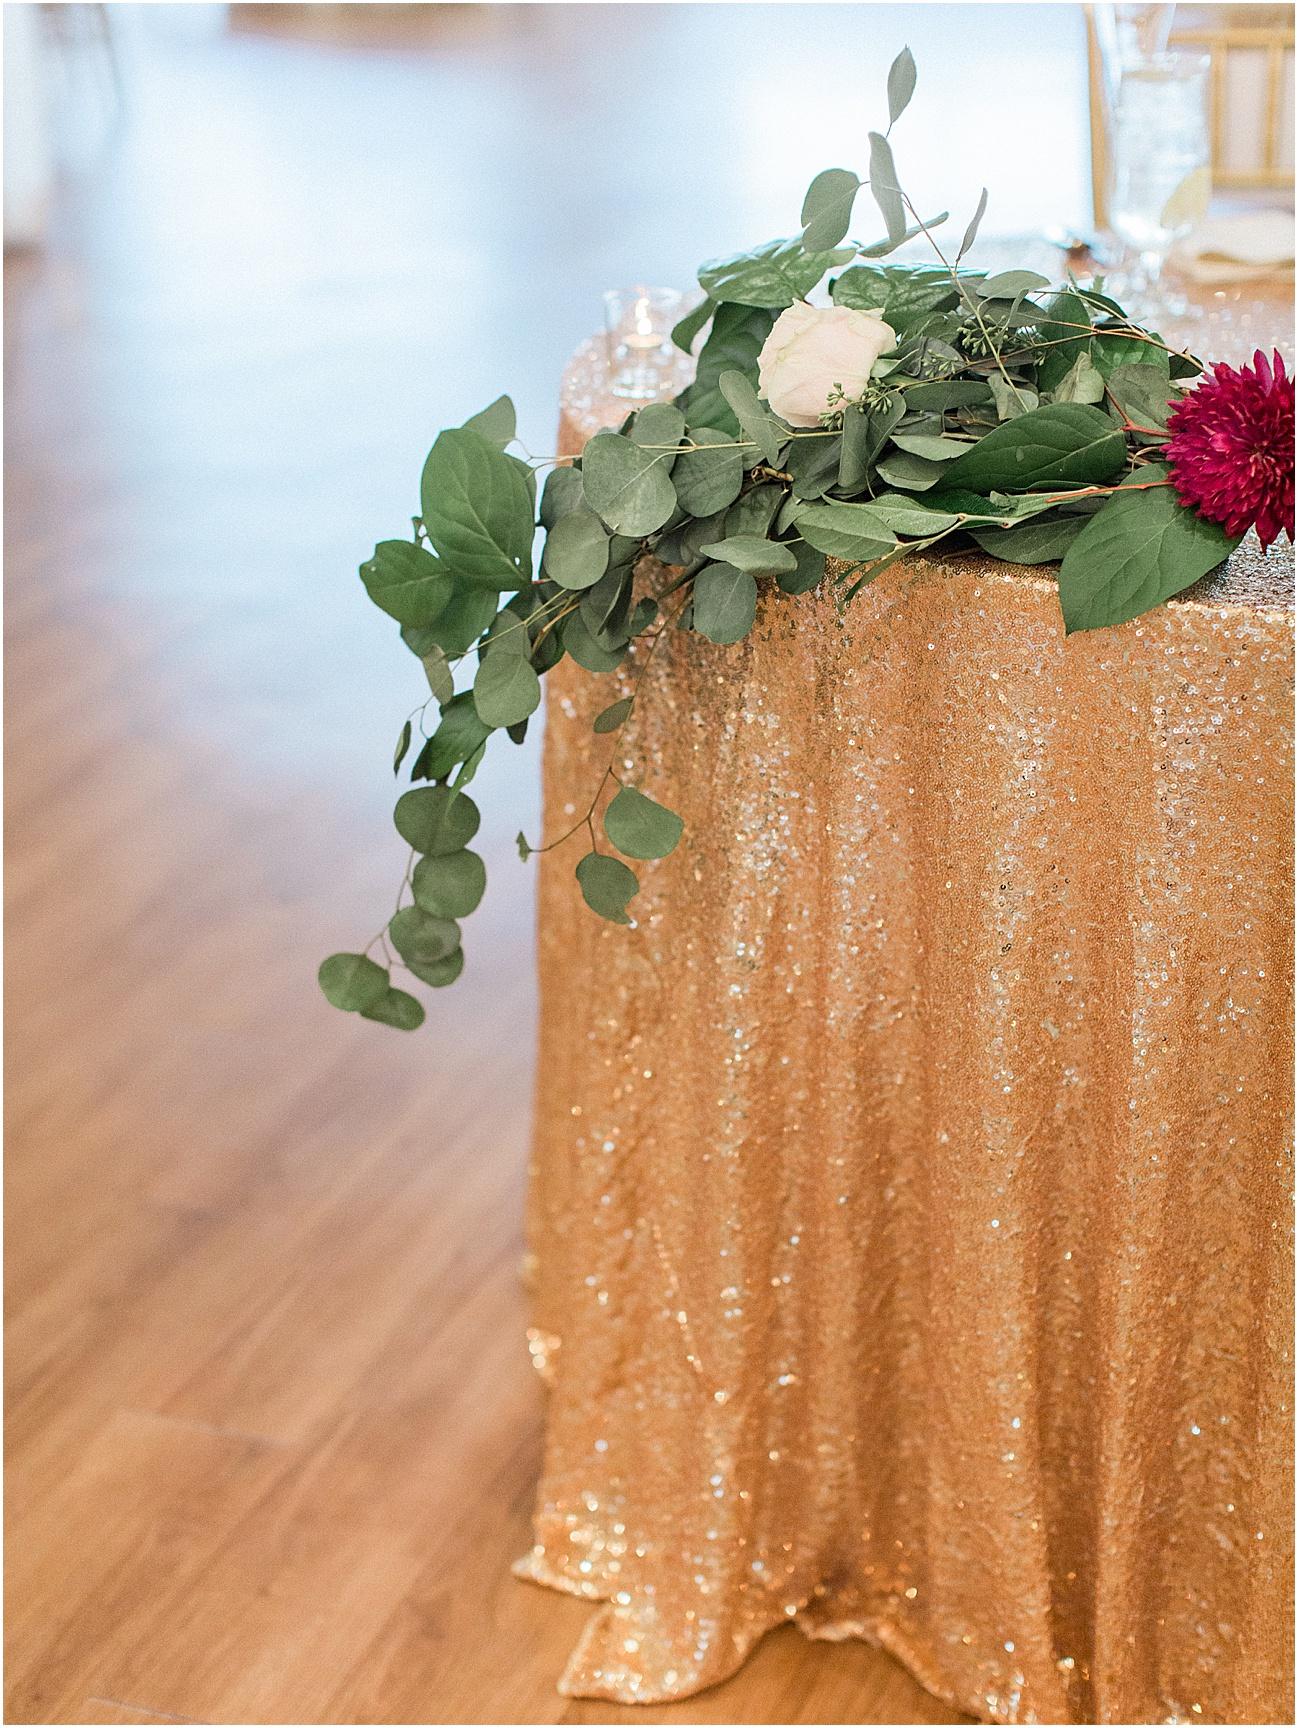 shannon_daniel_dan_atlantic_resort_saint_marys_st_mary_church_fall_newport_catholic_irish_cape_cod_boston_wedding_photographer_meredith_jane_photography_photo_1647.jpg